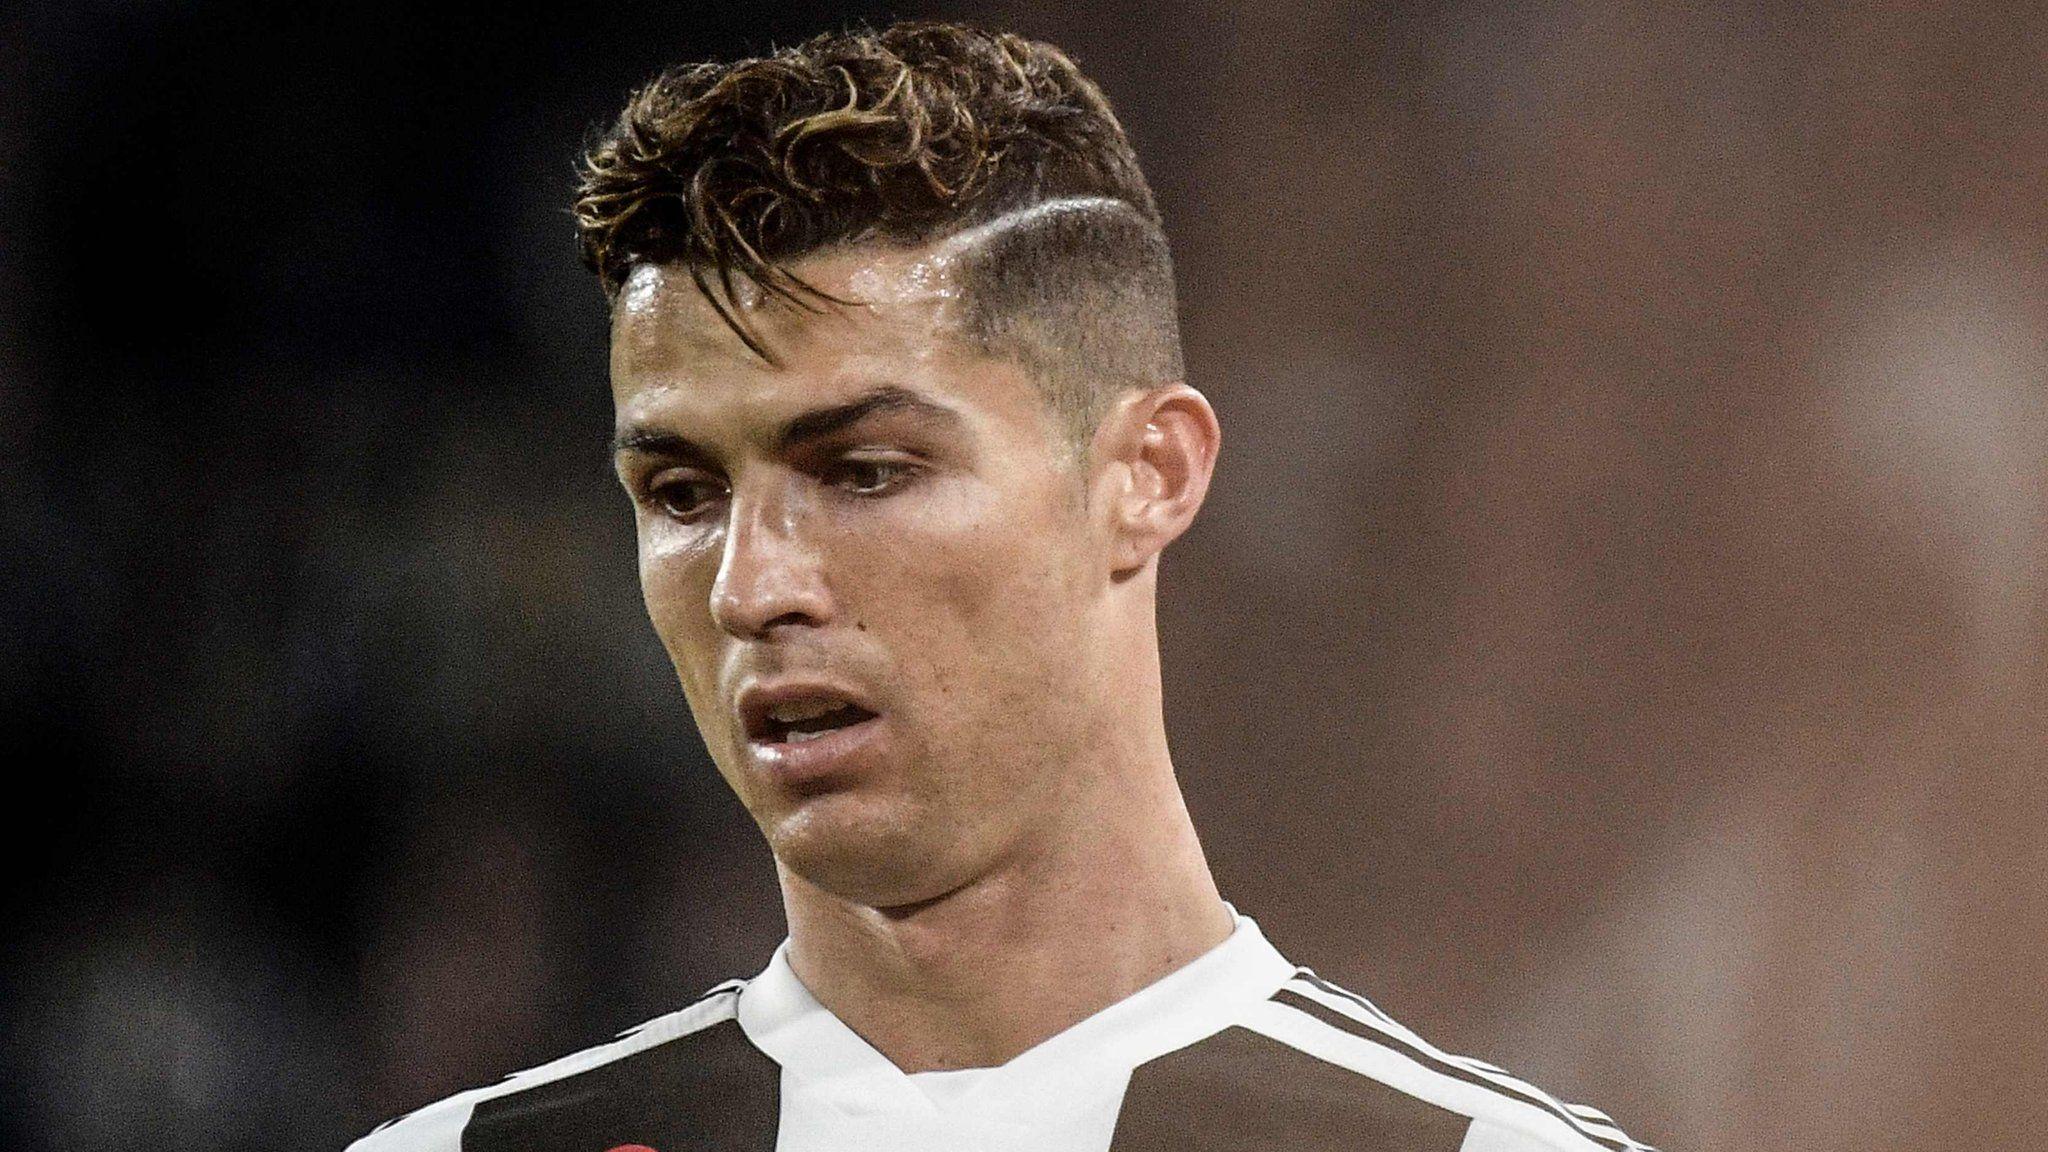 Cristiano Ronaldo New Hairstyle 2019